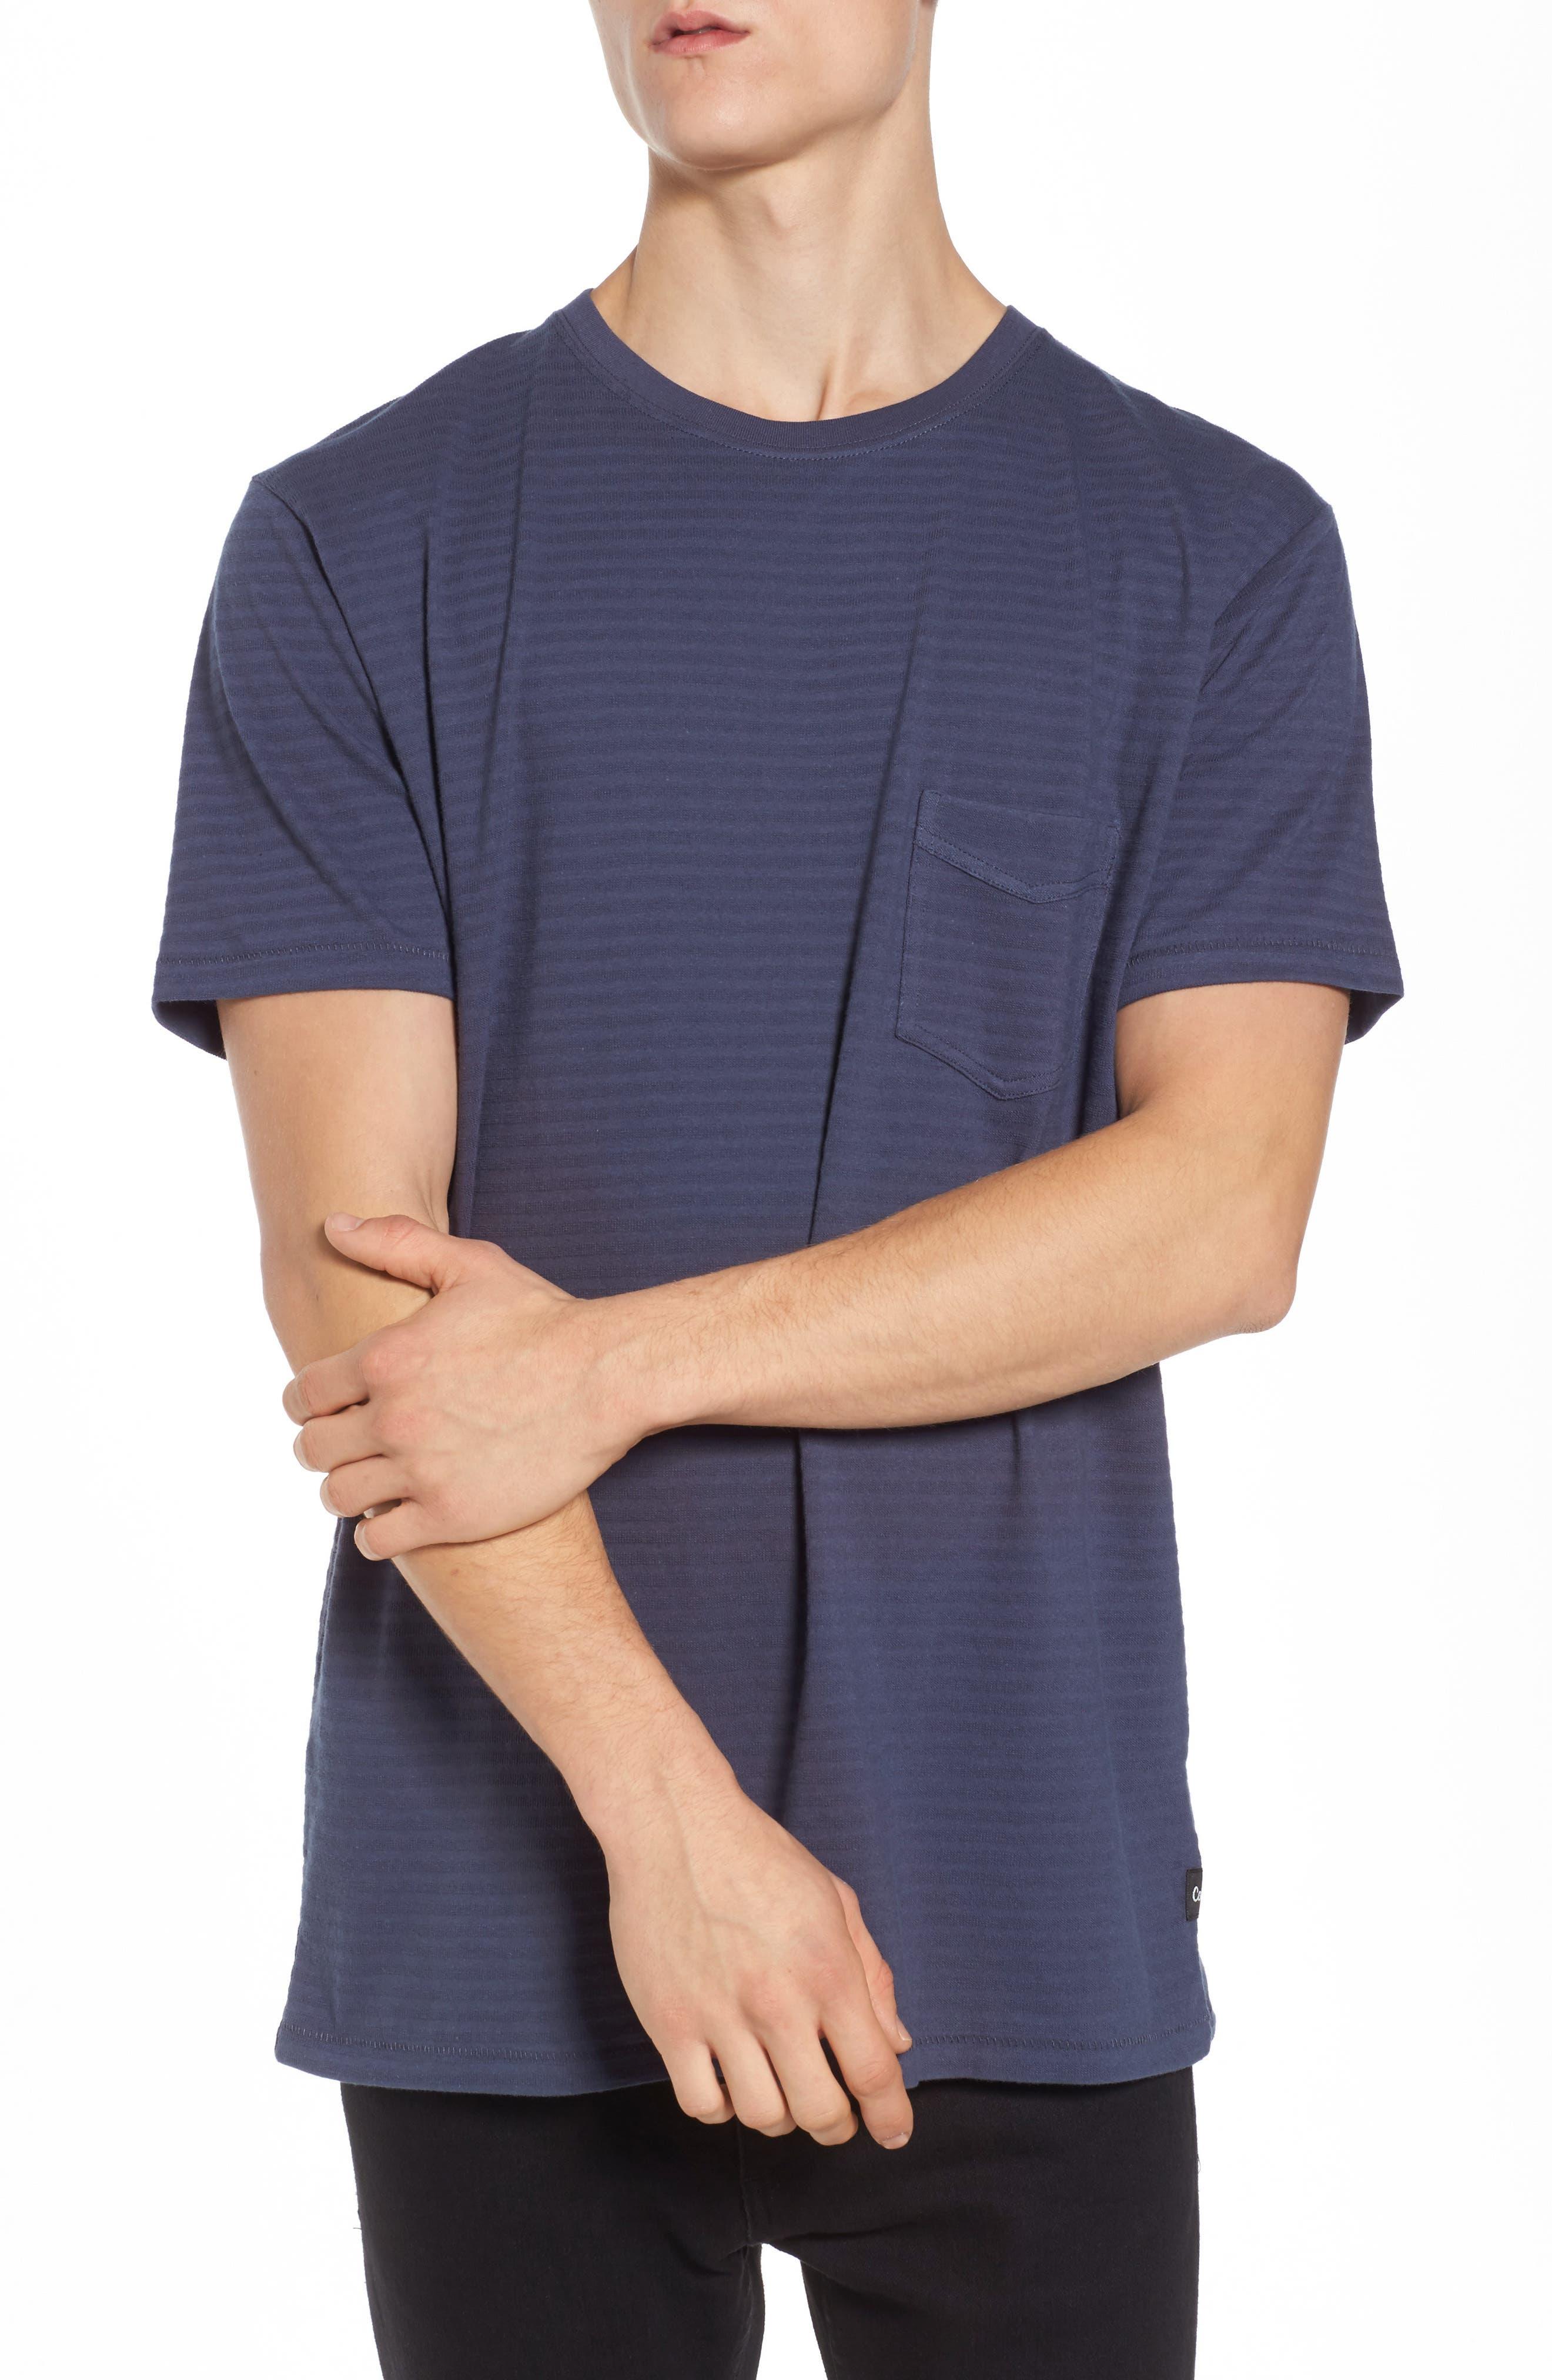 B. Elusive Pocket T-Shirt,                             Main thumbnail 1, color,                             Slate